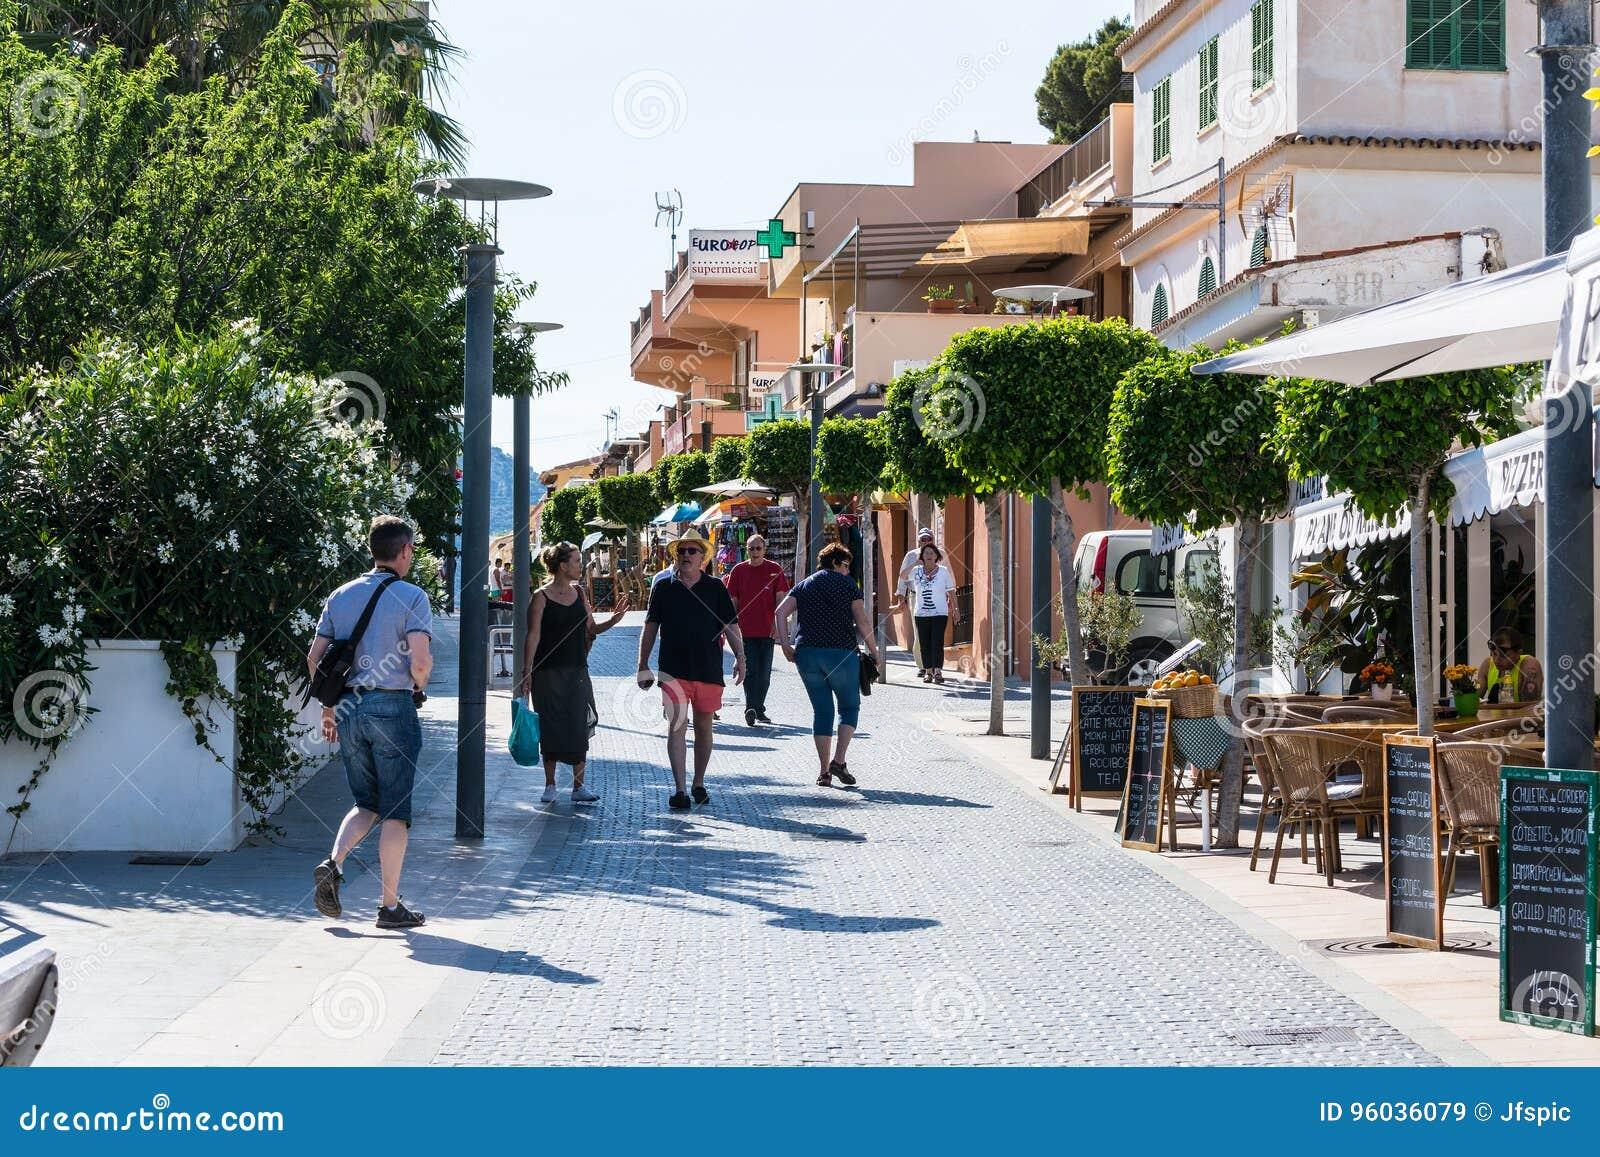 Zakupy ulica w miasteczku San Telmo, Mallorca, Hiszpania